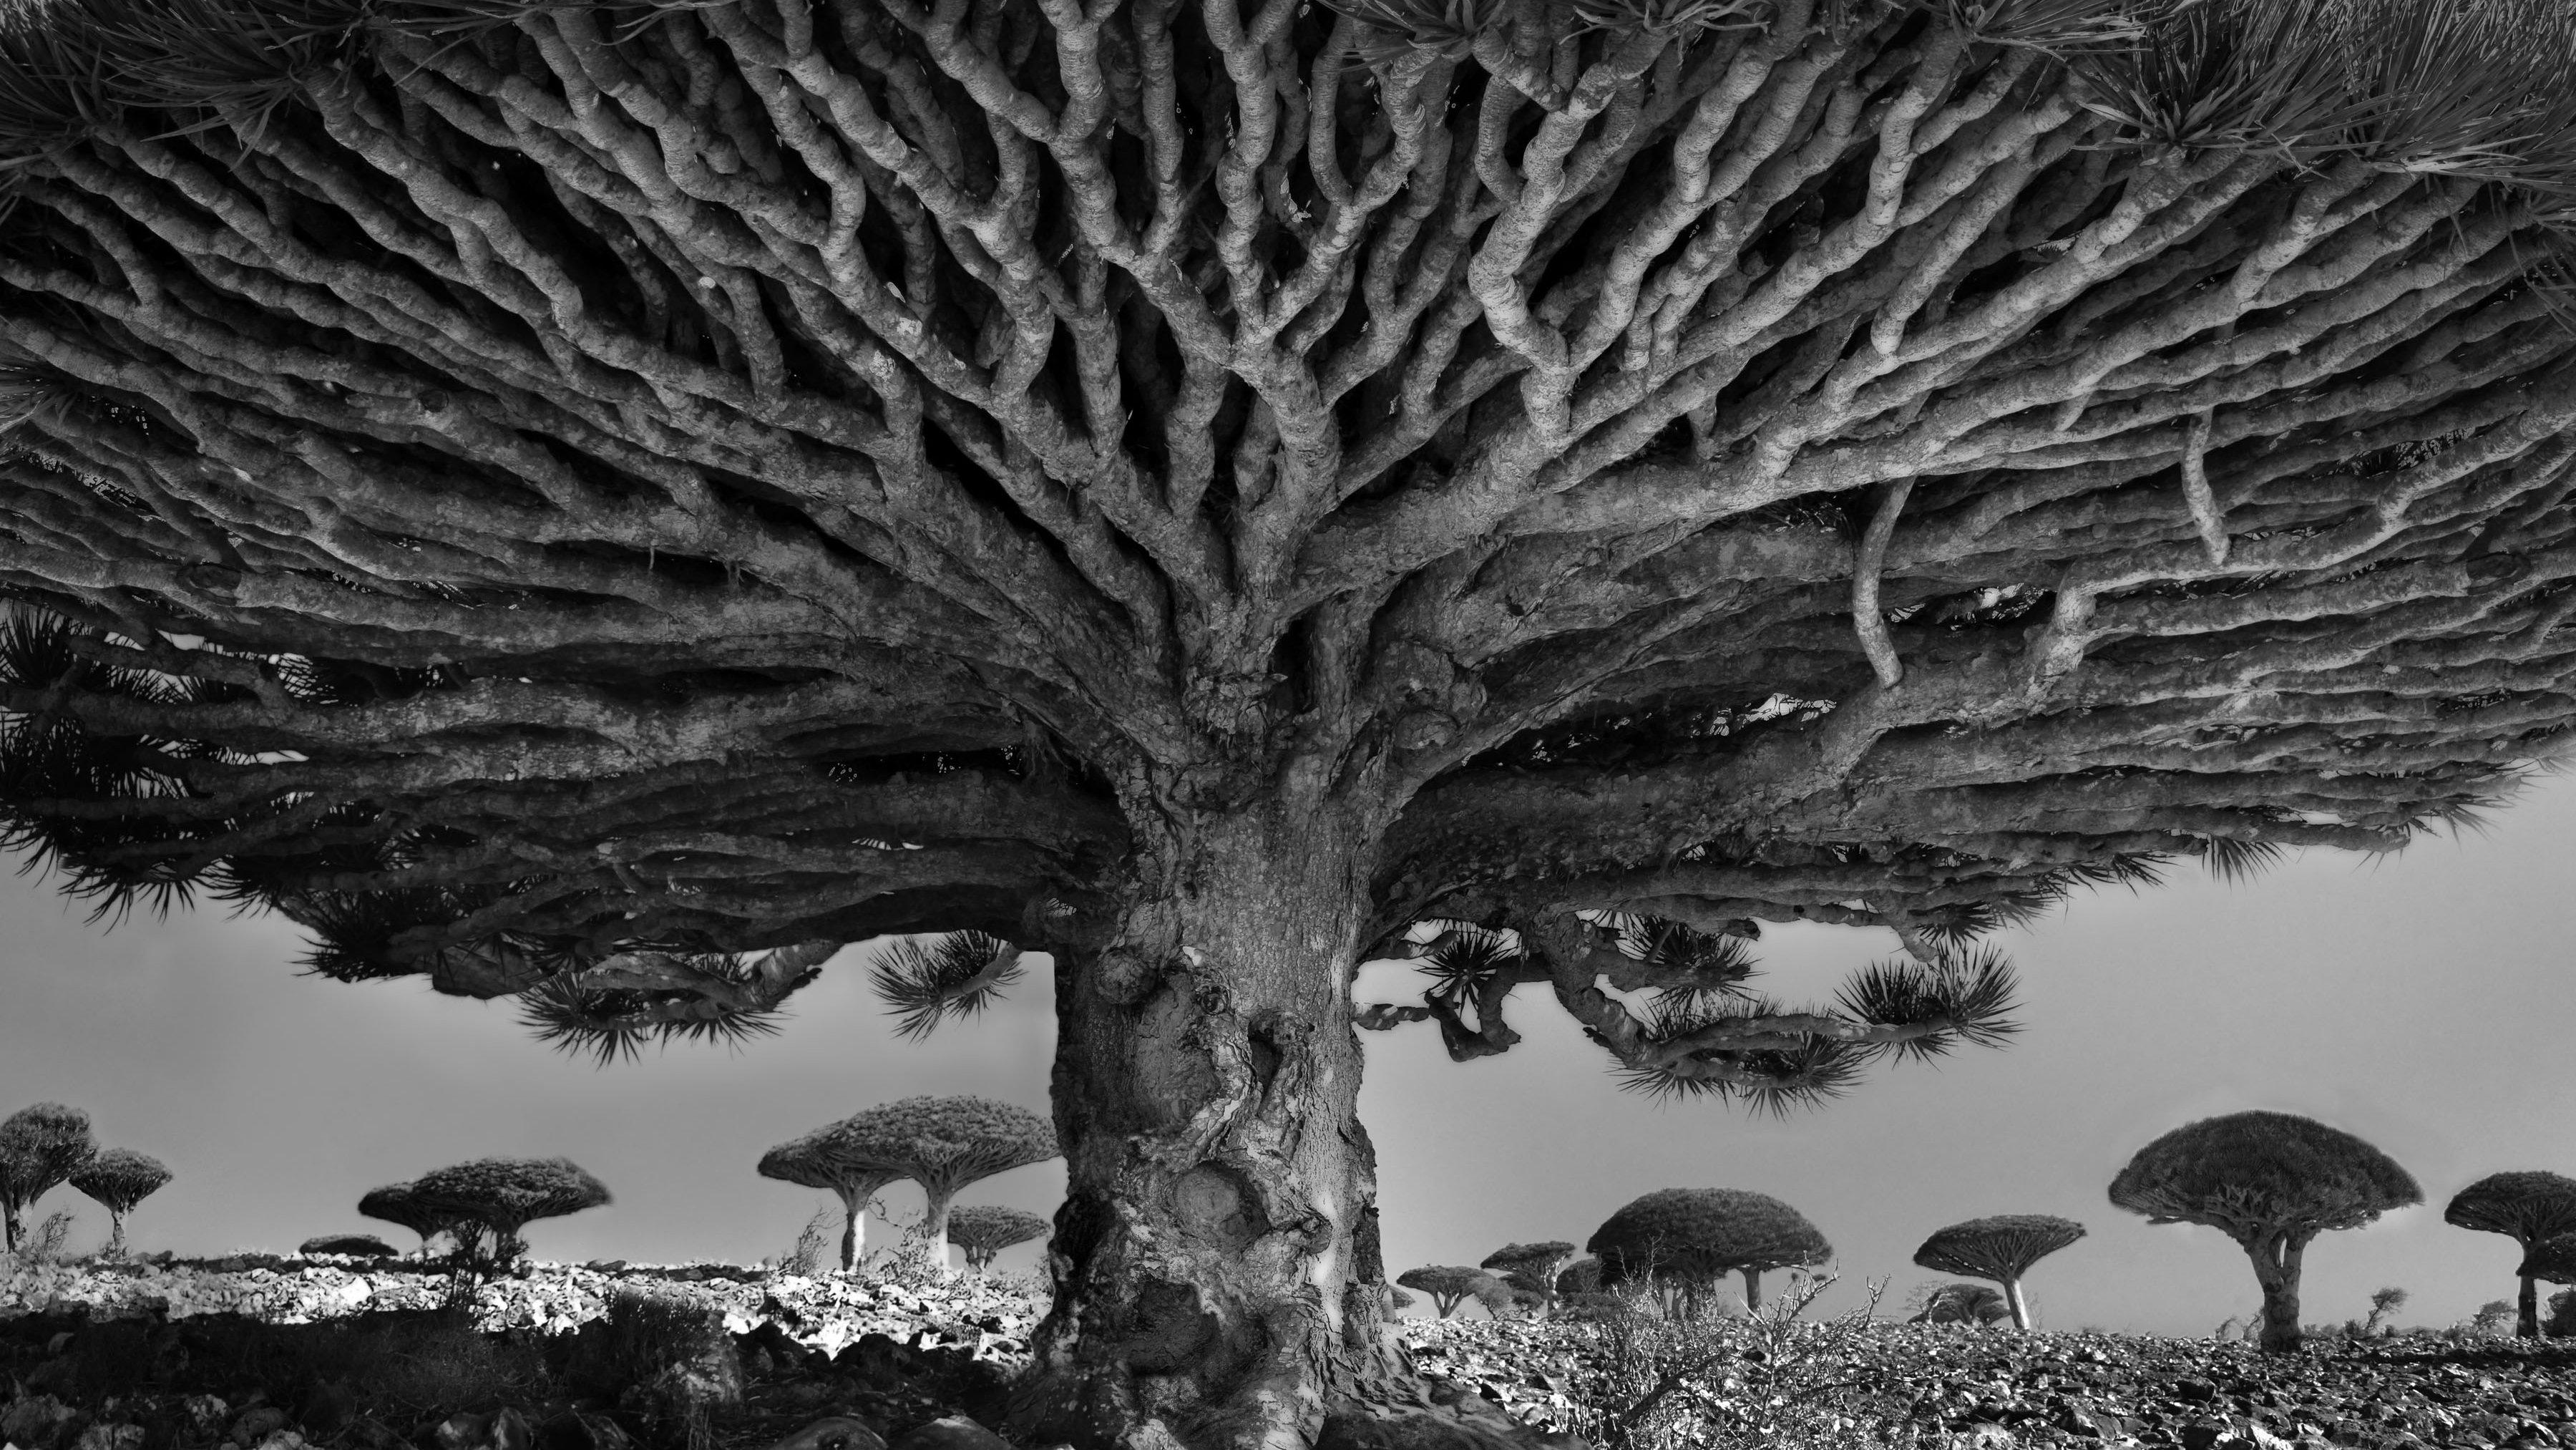 oldest tress in world (Beth Moon)